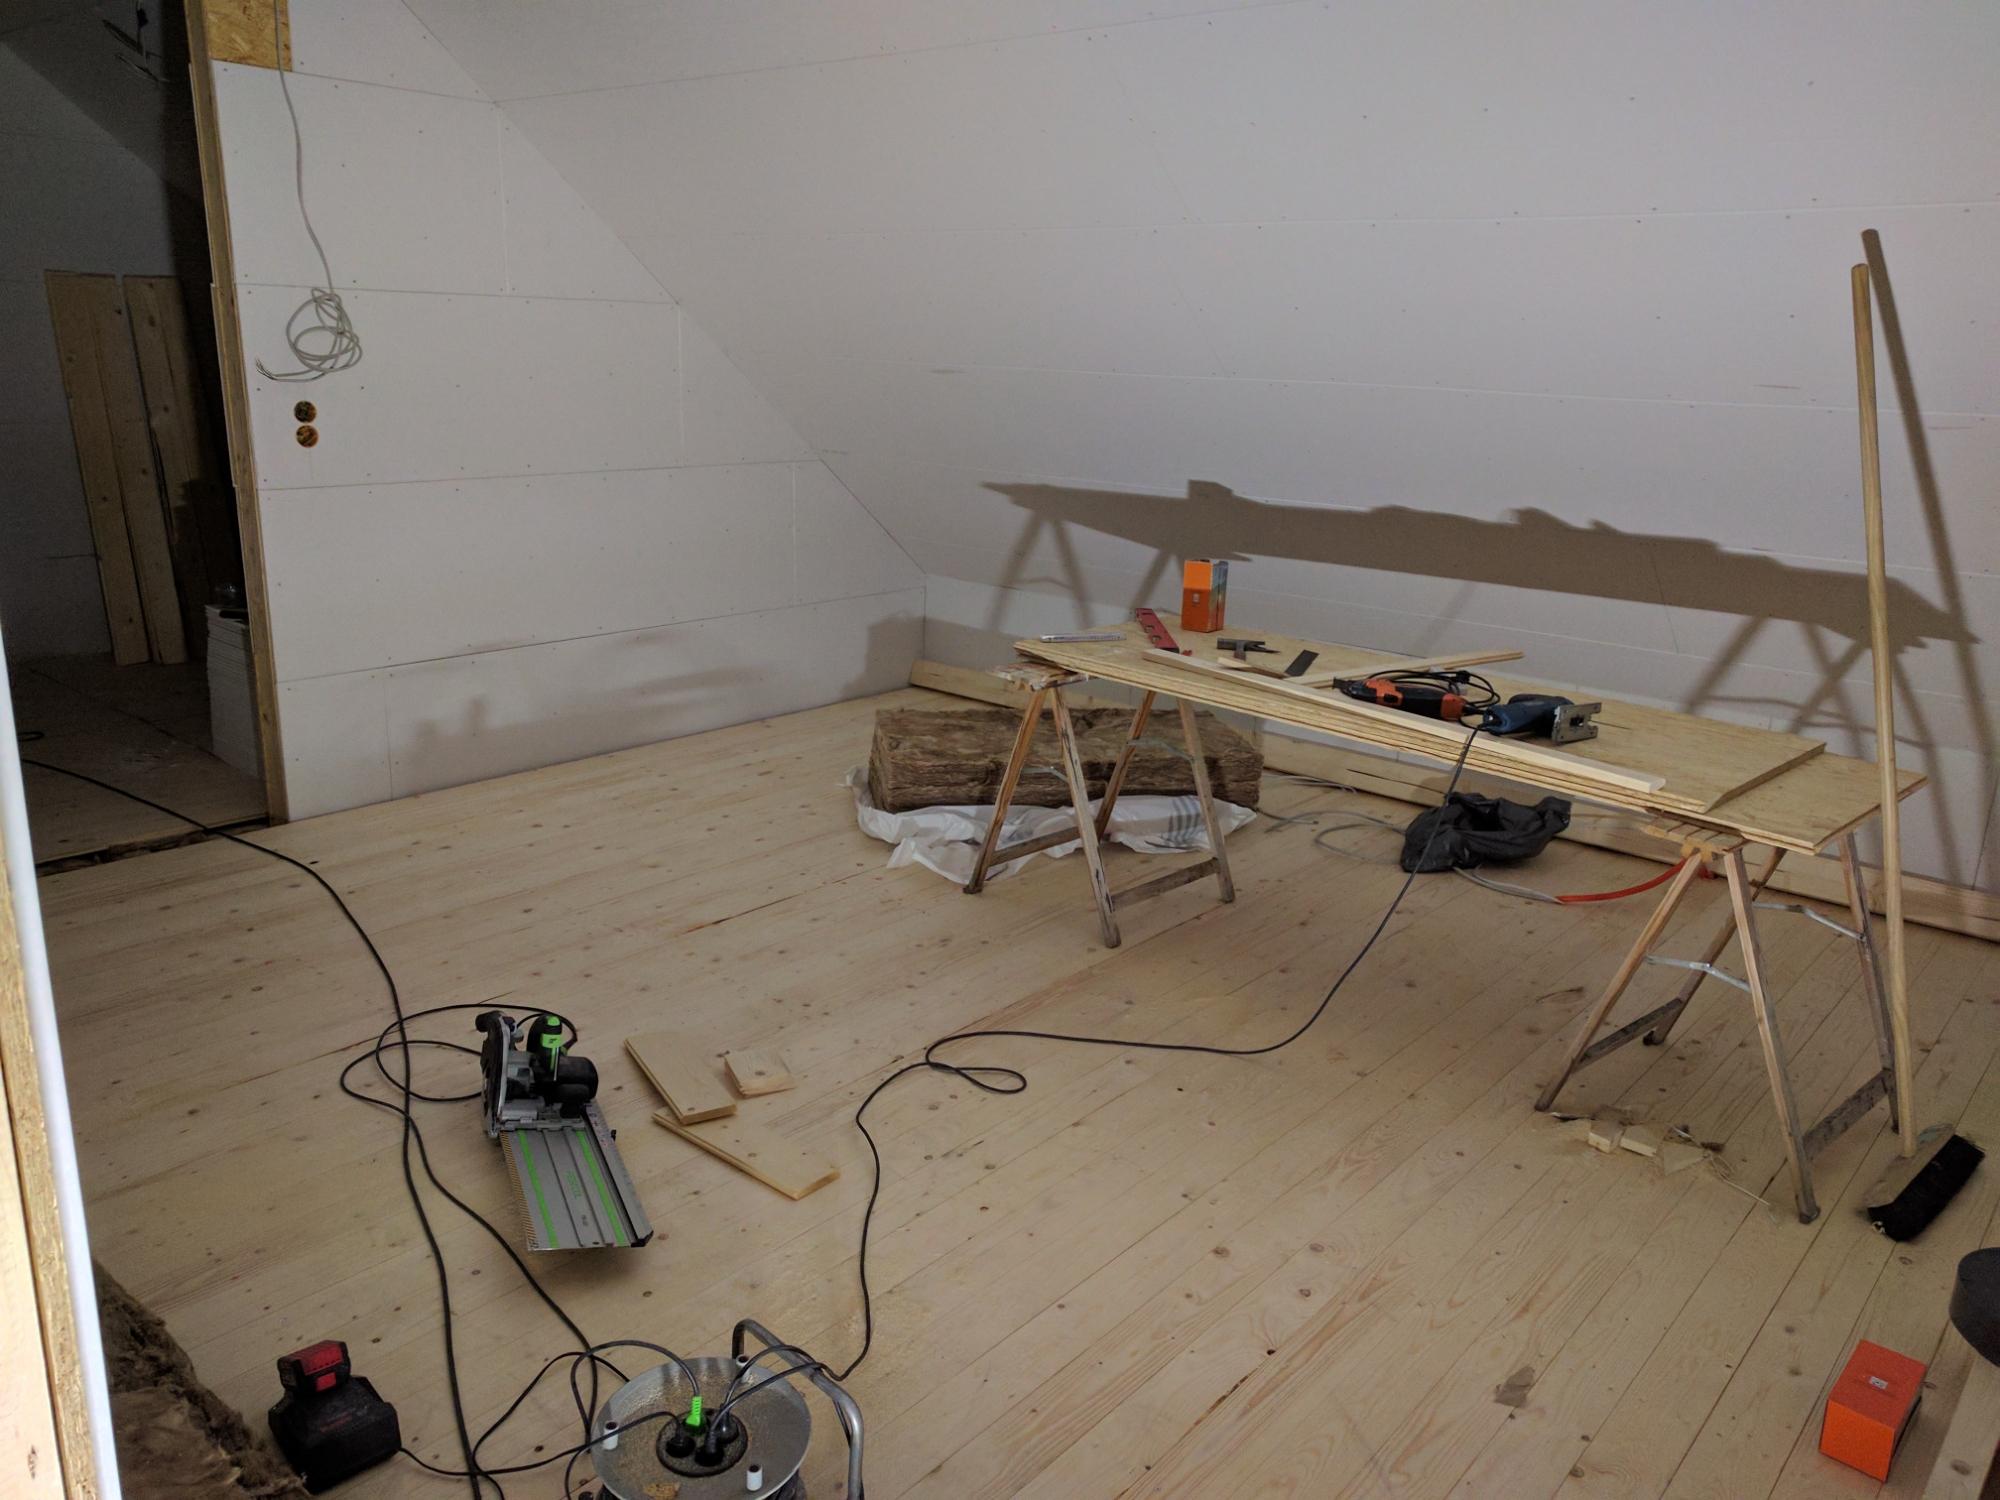 Fußbodenaufbau Bad ~ Rigips platten osb platten spachteln abschleifen fußbodenaufbau